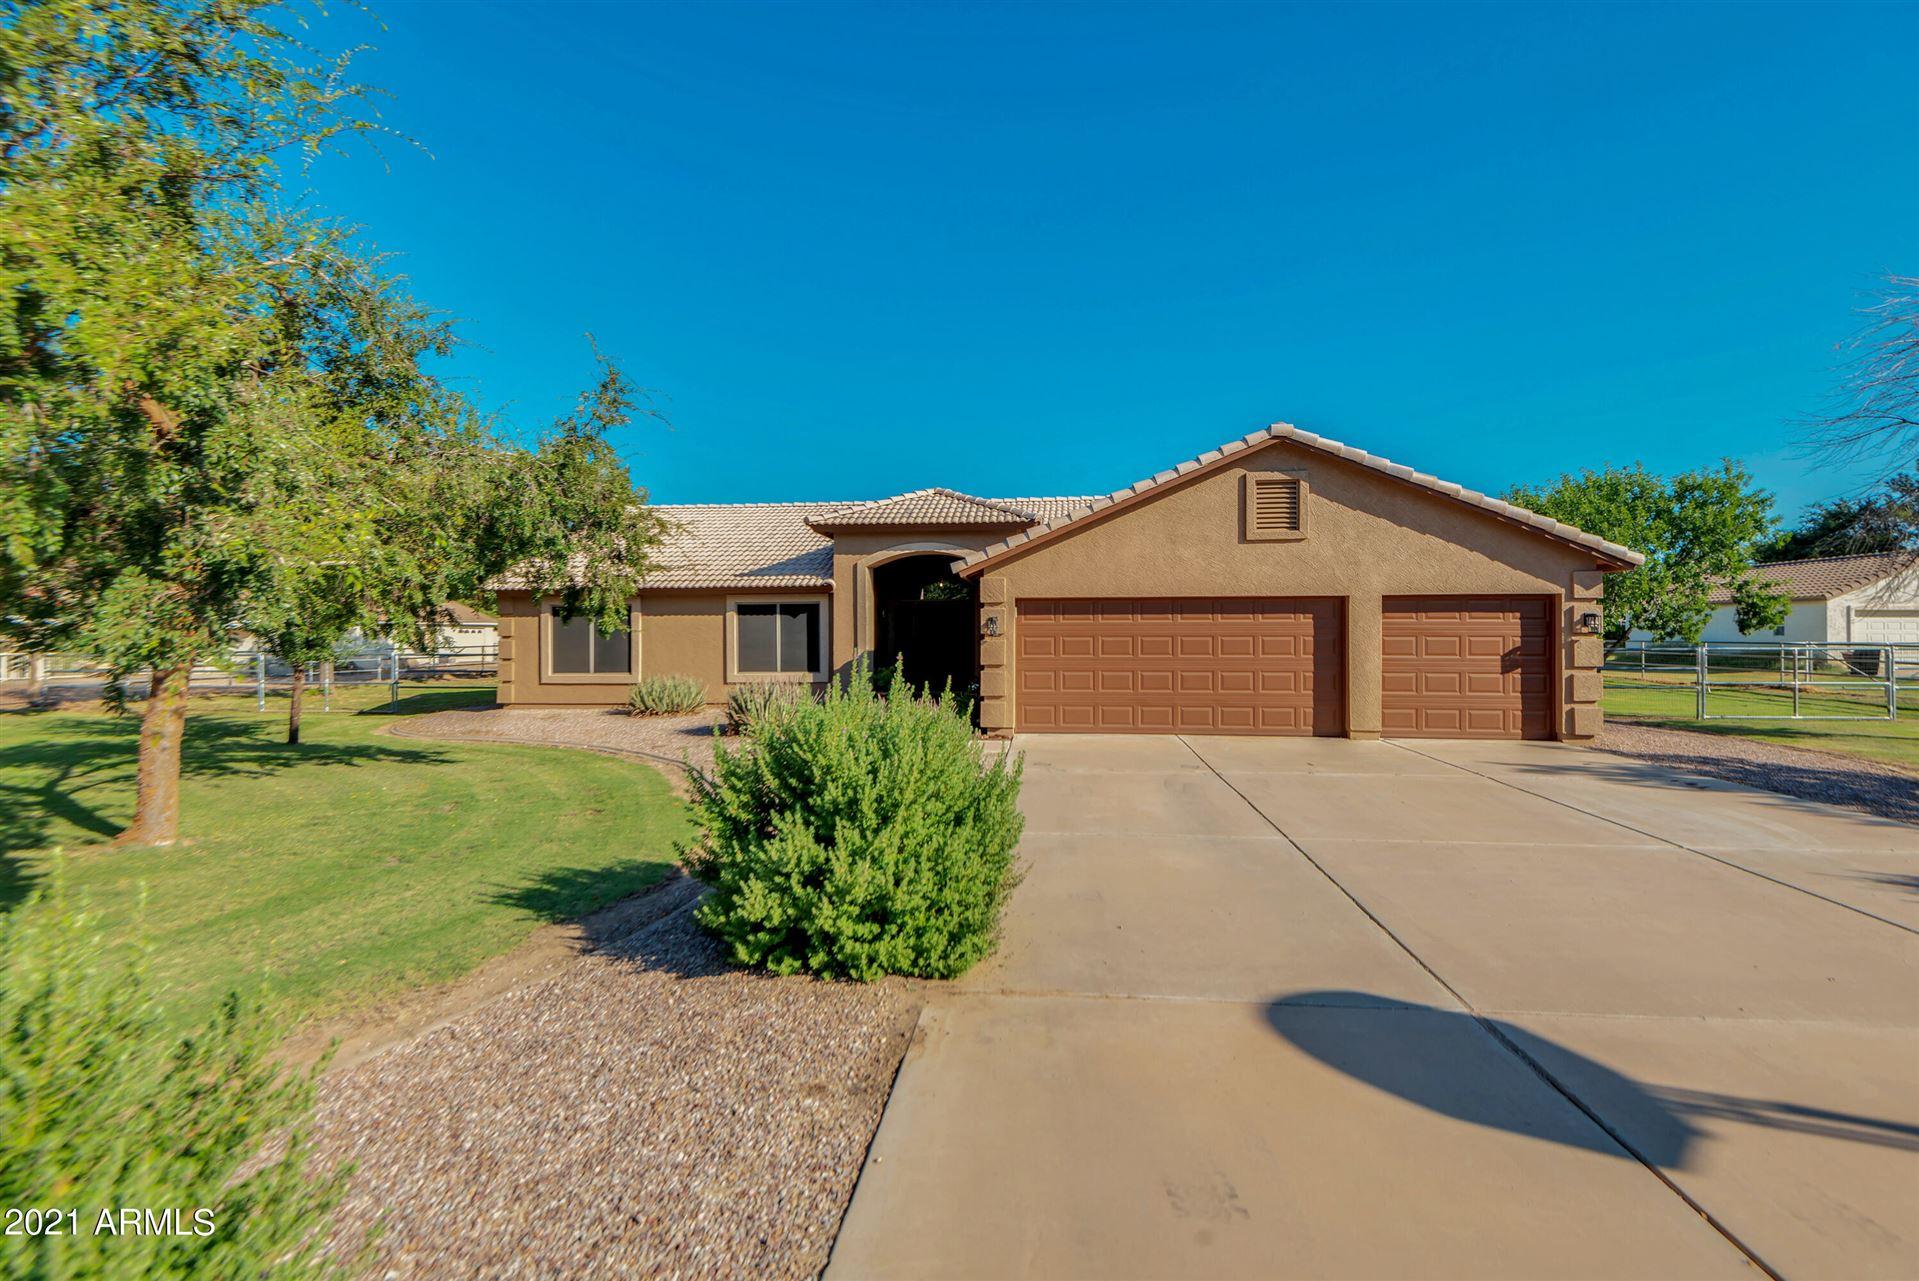 Photo of 22236 E VALLEJO Street, Queen Creek, AZ 85142 (MLS # 6302657)